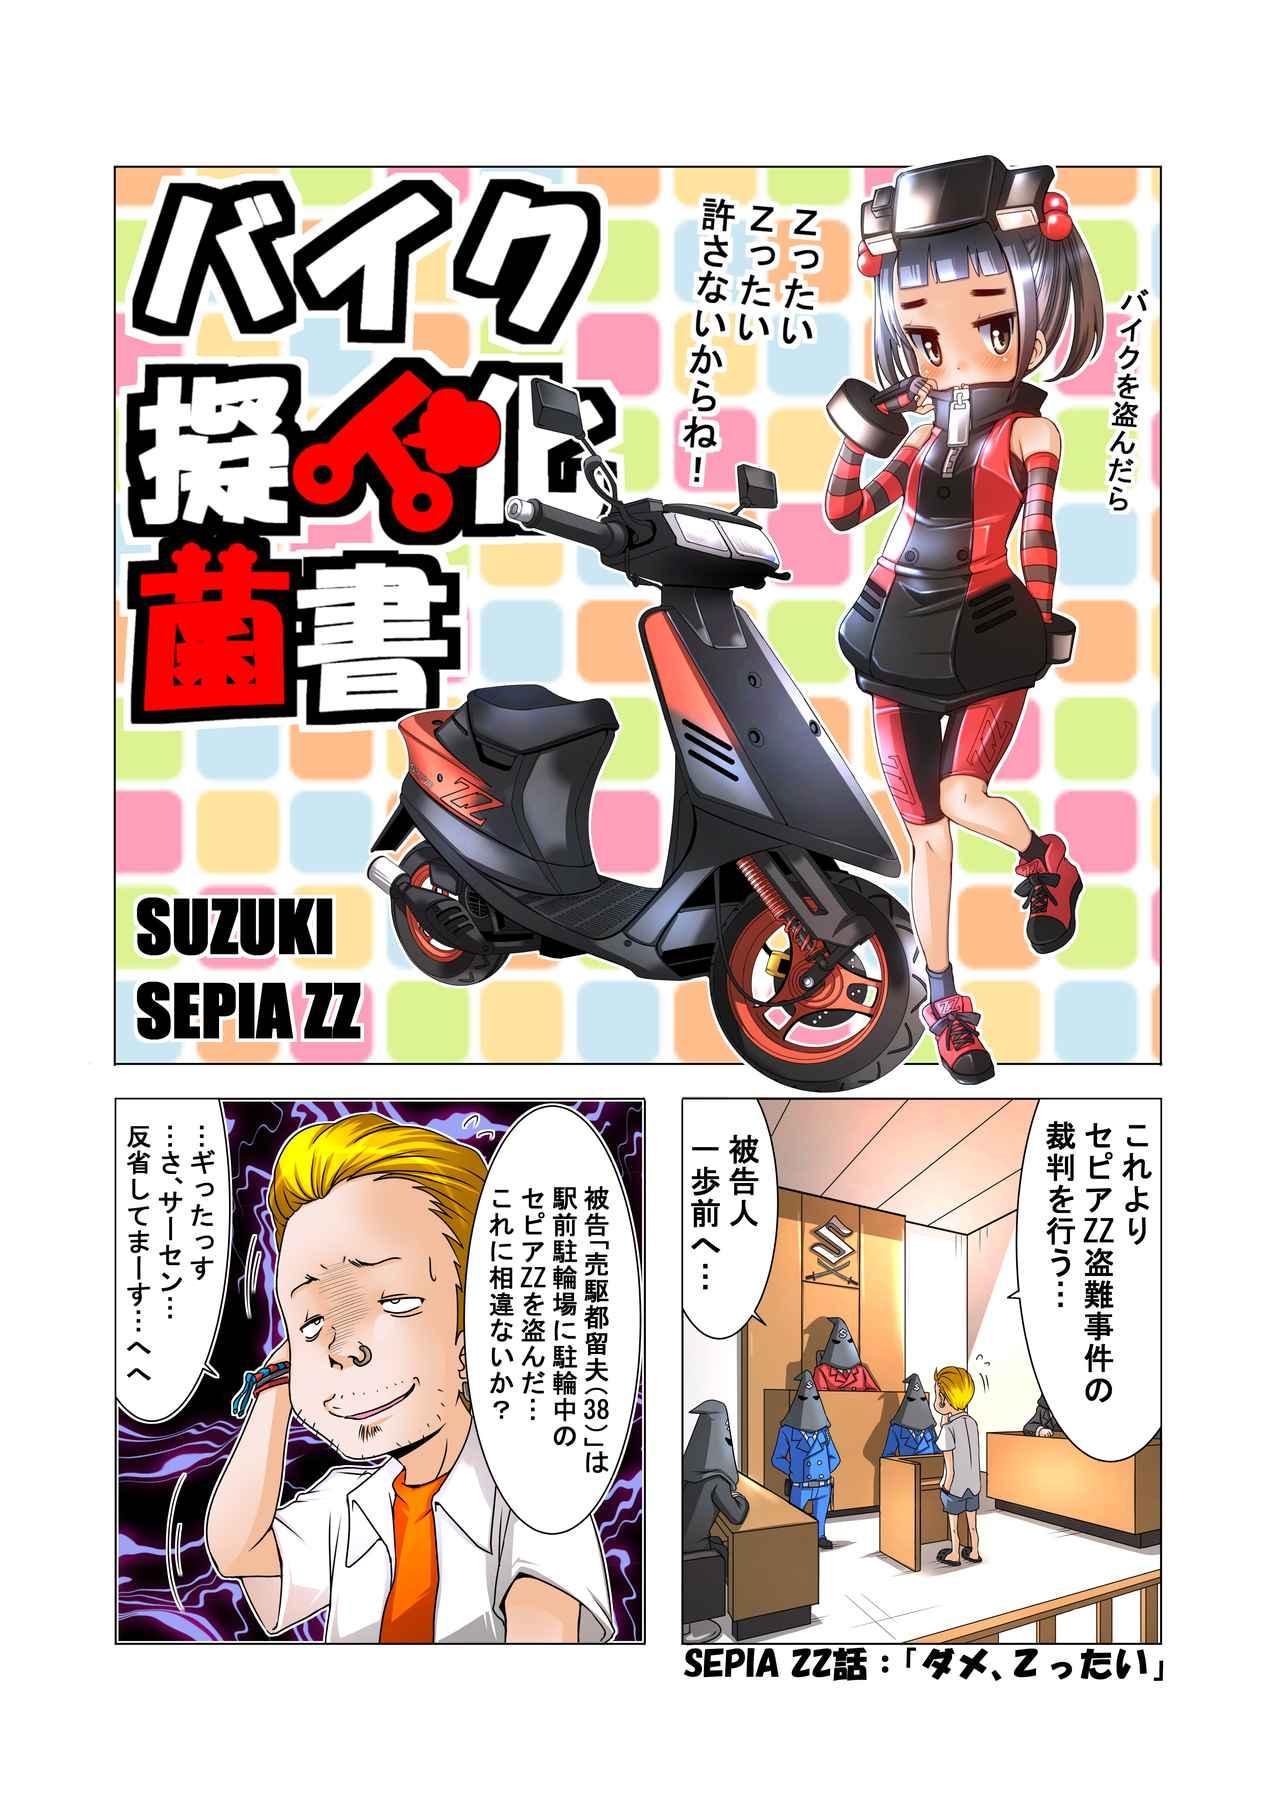 画像1: 『バイク擬人化菌書』単行本 第1〜5巻、好評発売中!